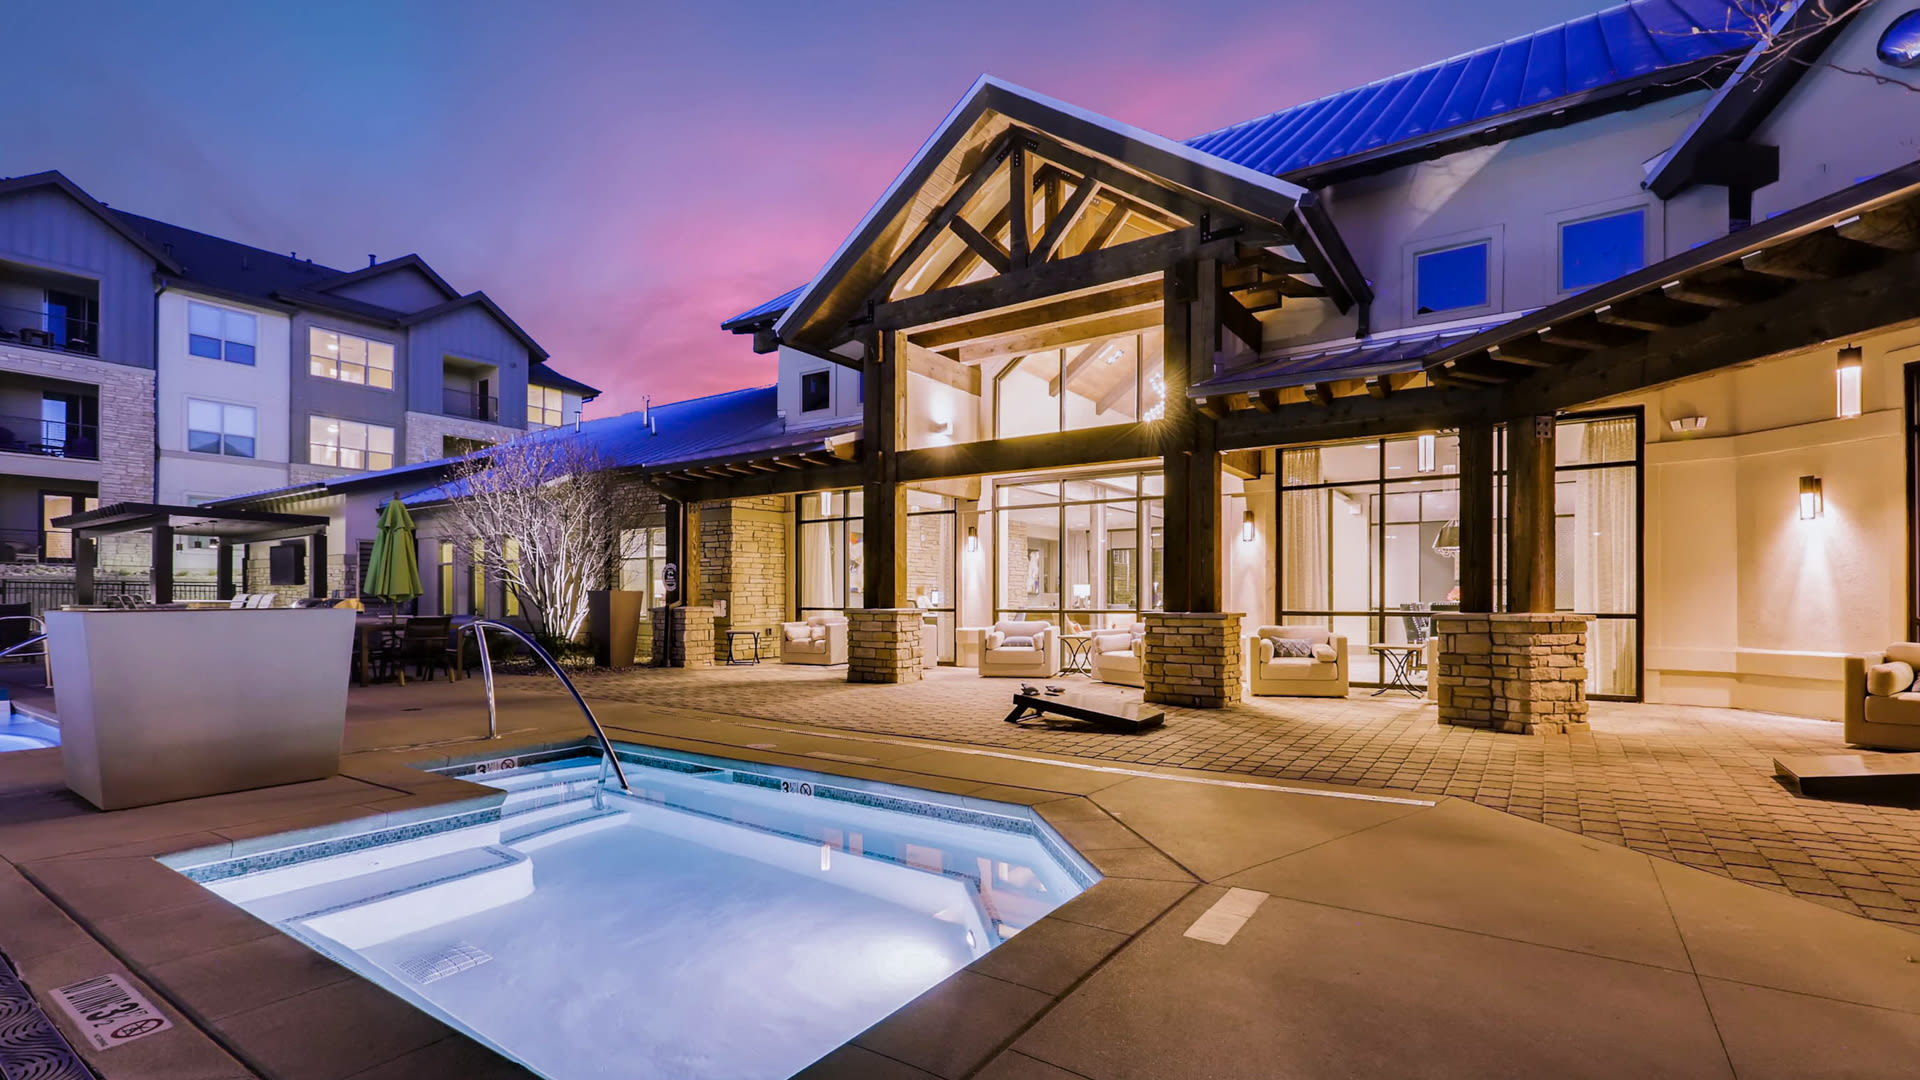 Venue at the Promenade - Pool and Spa